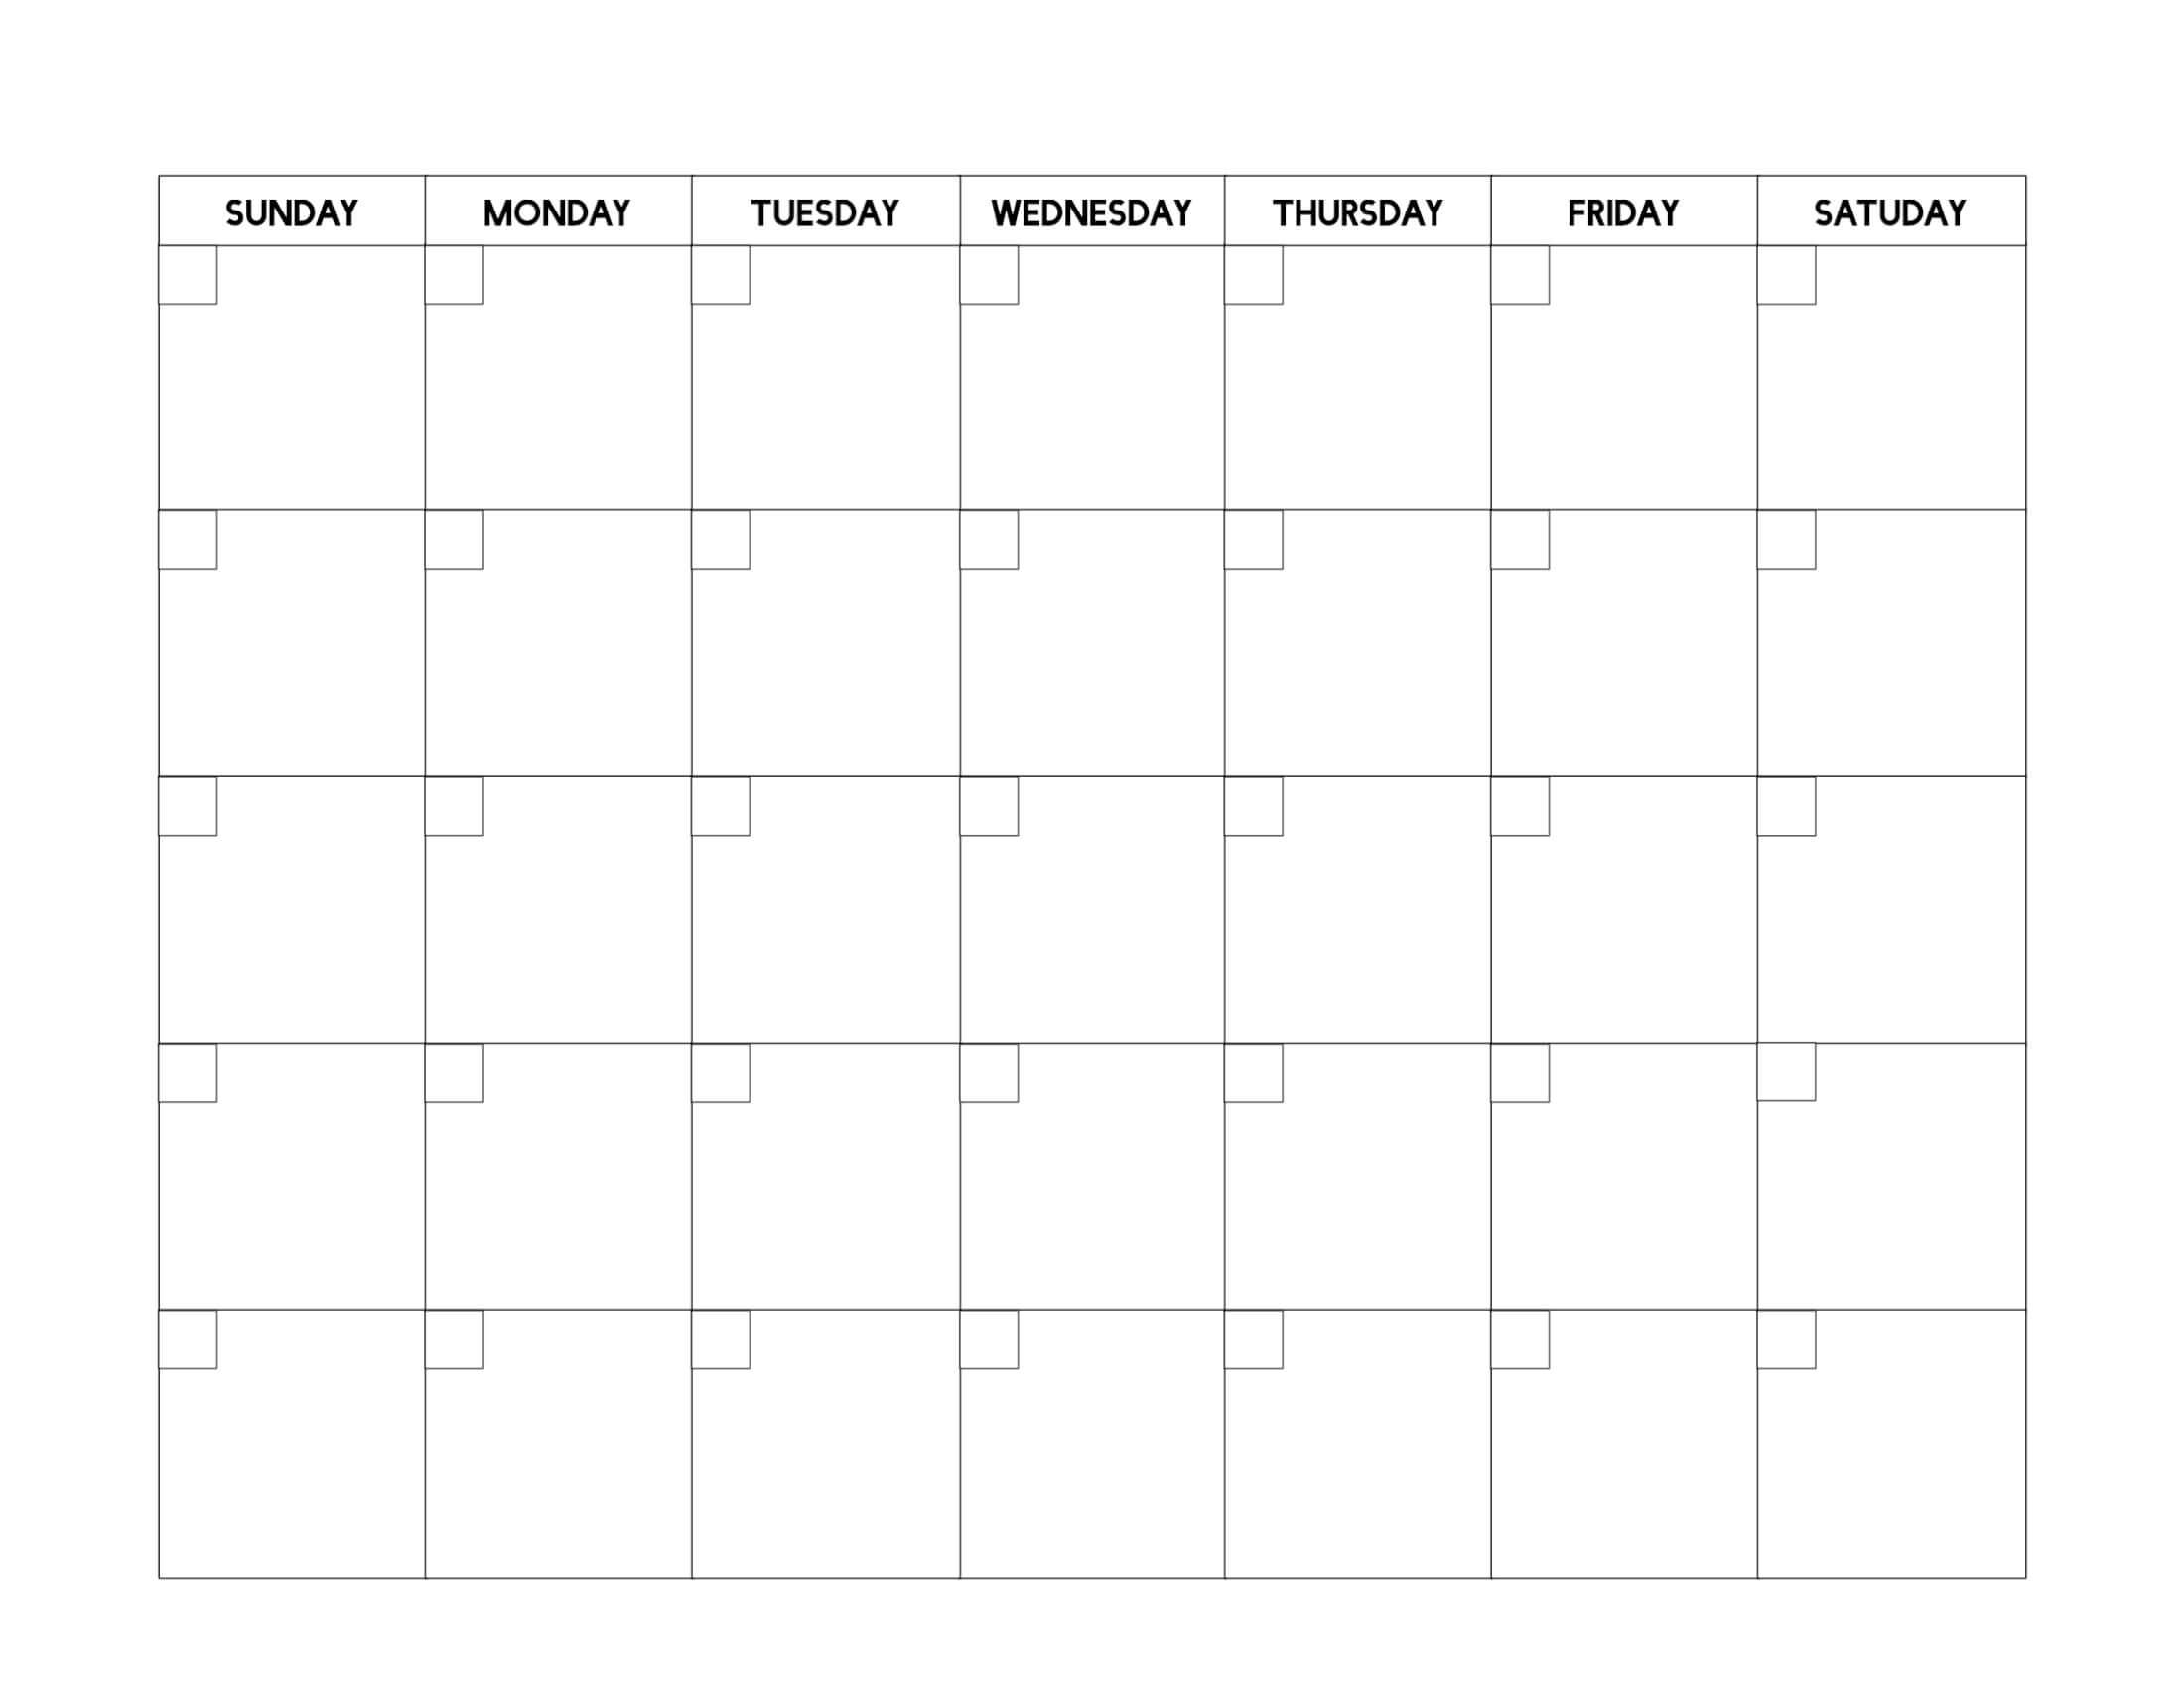 Free Printable Blank Calendar Template - Paper Trail Design inside Blank Calander Template